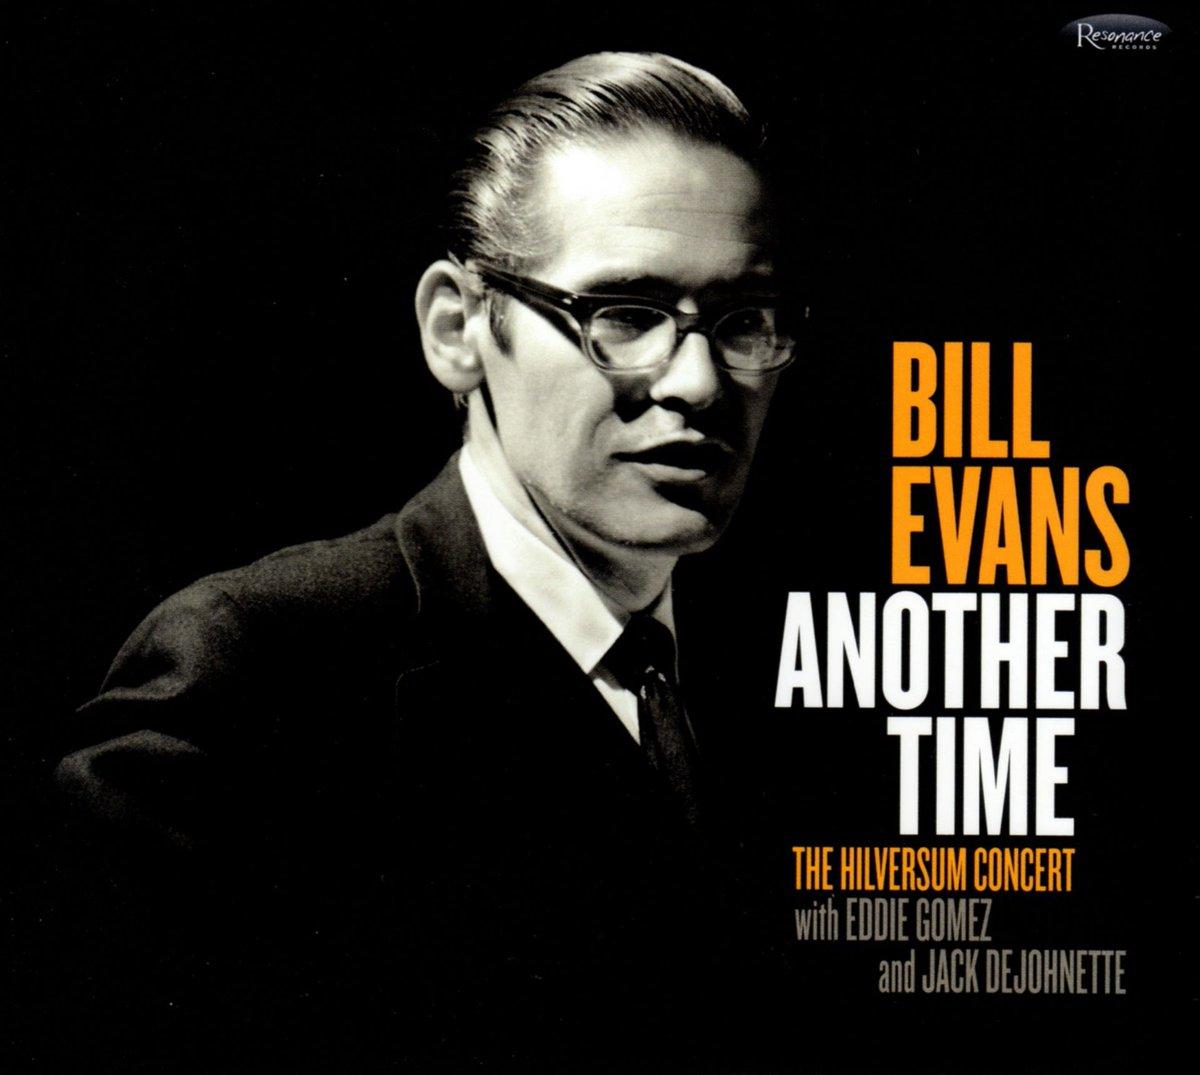 Tavsiye: #BillEvans | Another Time | The Hilversum Concert  https:// itunes.apple.com/tr/album/anoth er-time-the-hilversum-concert-live/1226876072 &nbsp; … <br>http://pic.twitter.com/X2WJGzBTyj